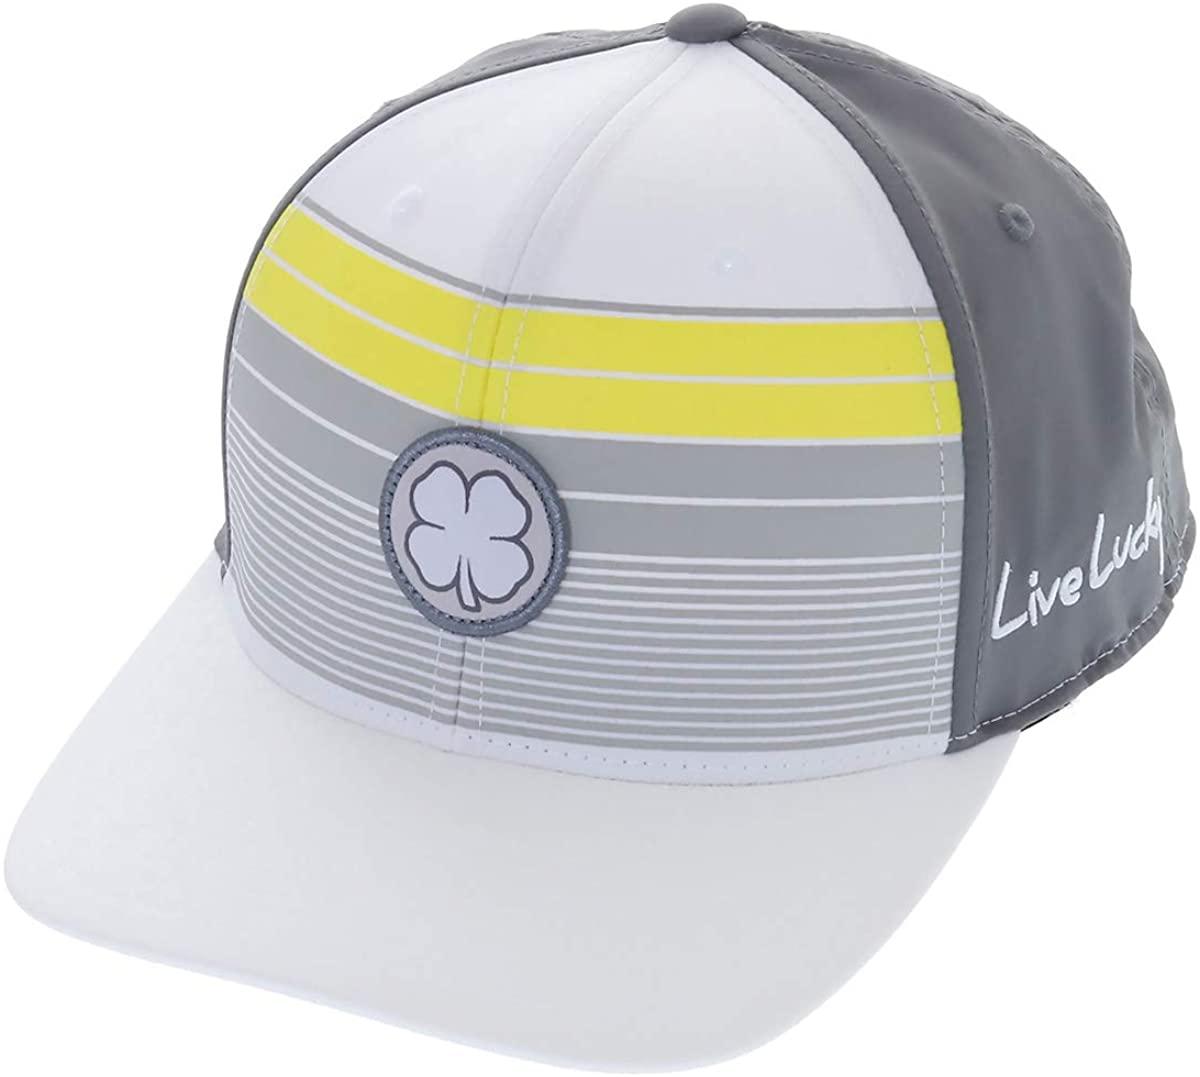 Black Clover New Live Lucky Island Sun White/Grey/Yellow Adjustable Hat/Cap